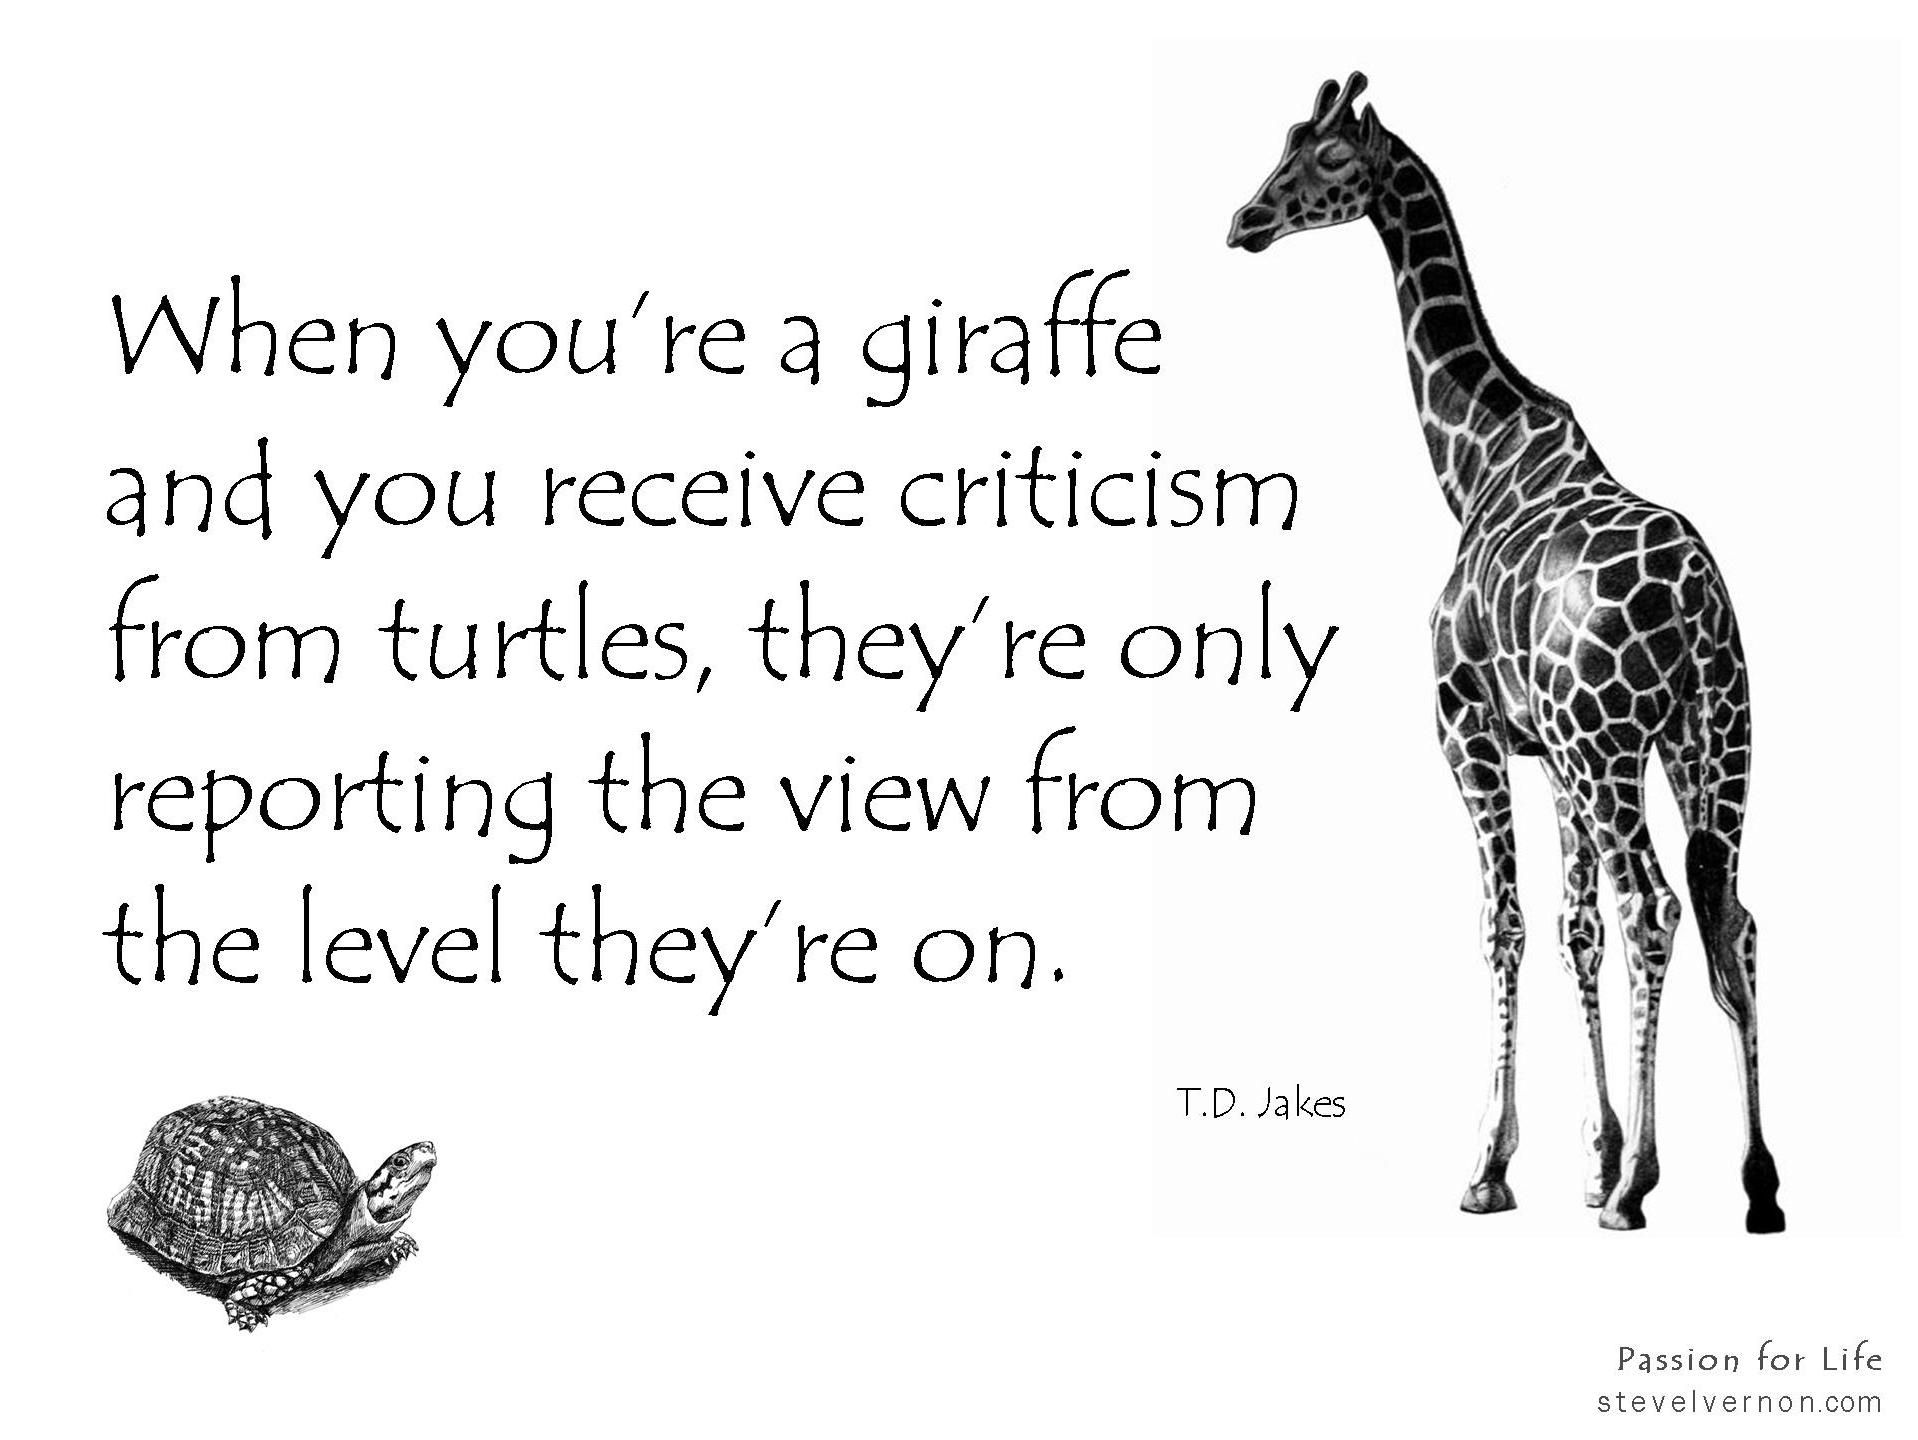 Criticism giraffe turtle perception perspective key concepts criticism giraffe turtle perception perspective biocorpaavc Choice Image